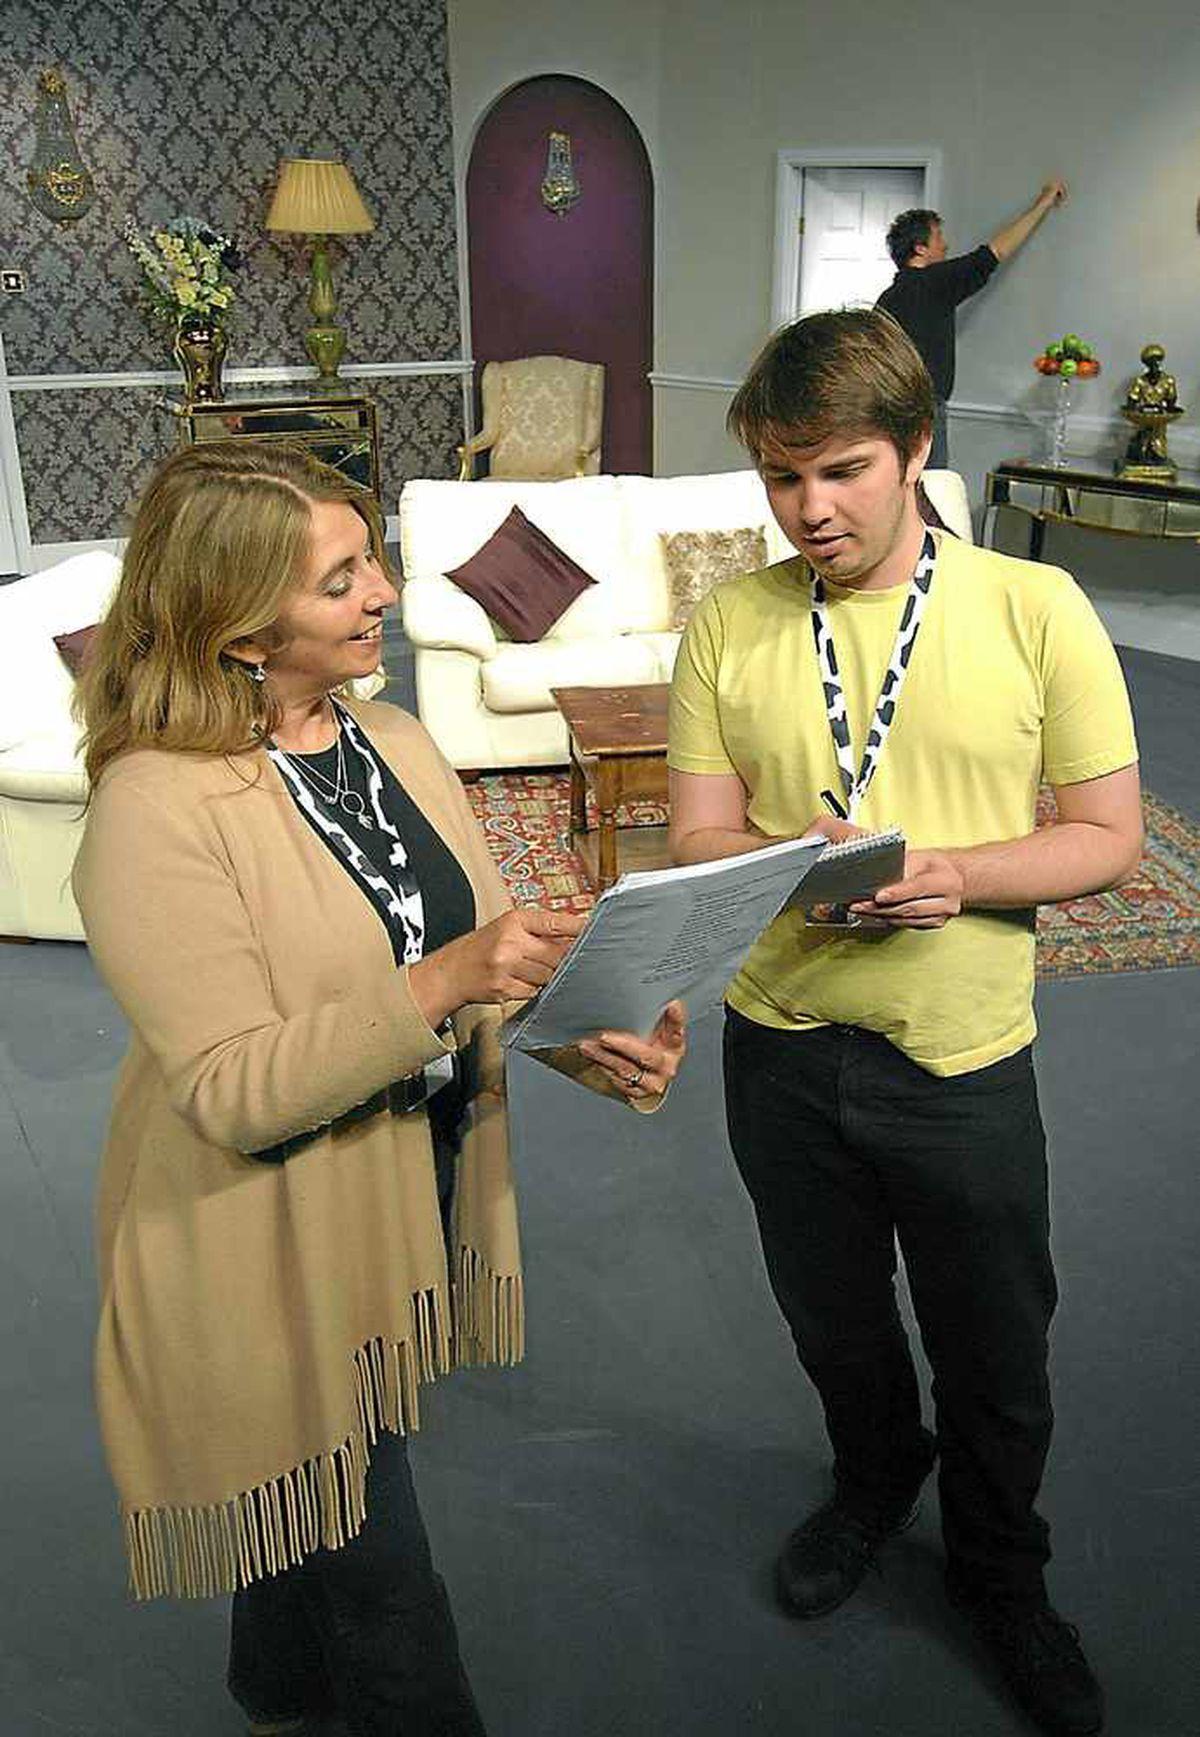 Director Alex Hinton and her son, sound designer Andrew